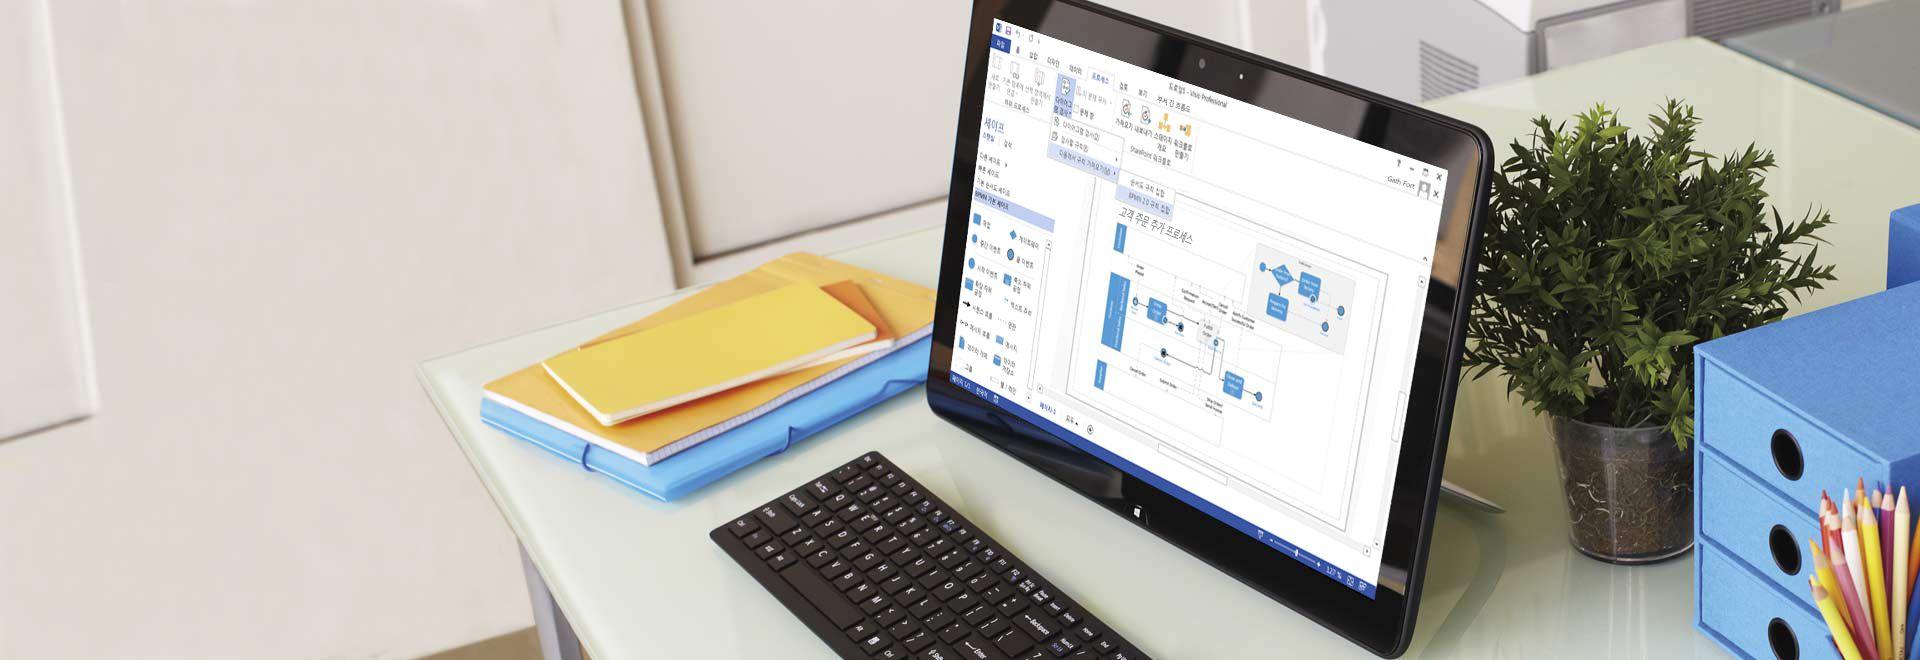 Visio Professional 2016의 프로세스 다이어그램을 표시하는 태블릿 컴퓨터가 있는 데스크